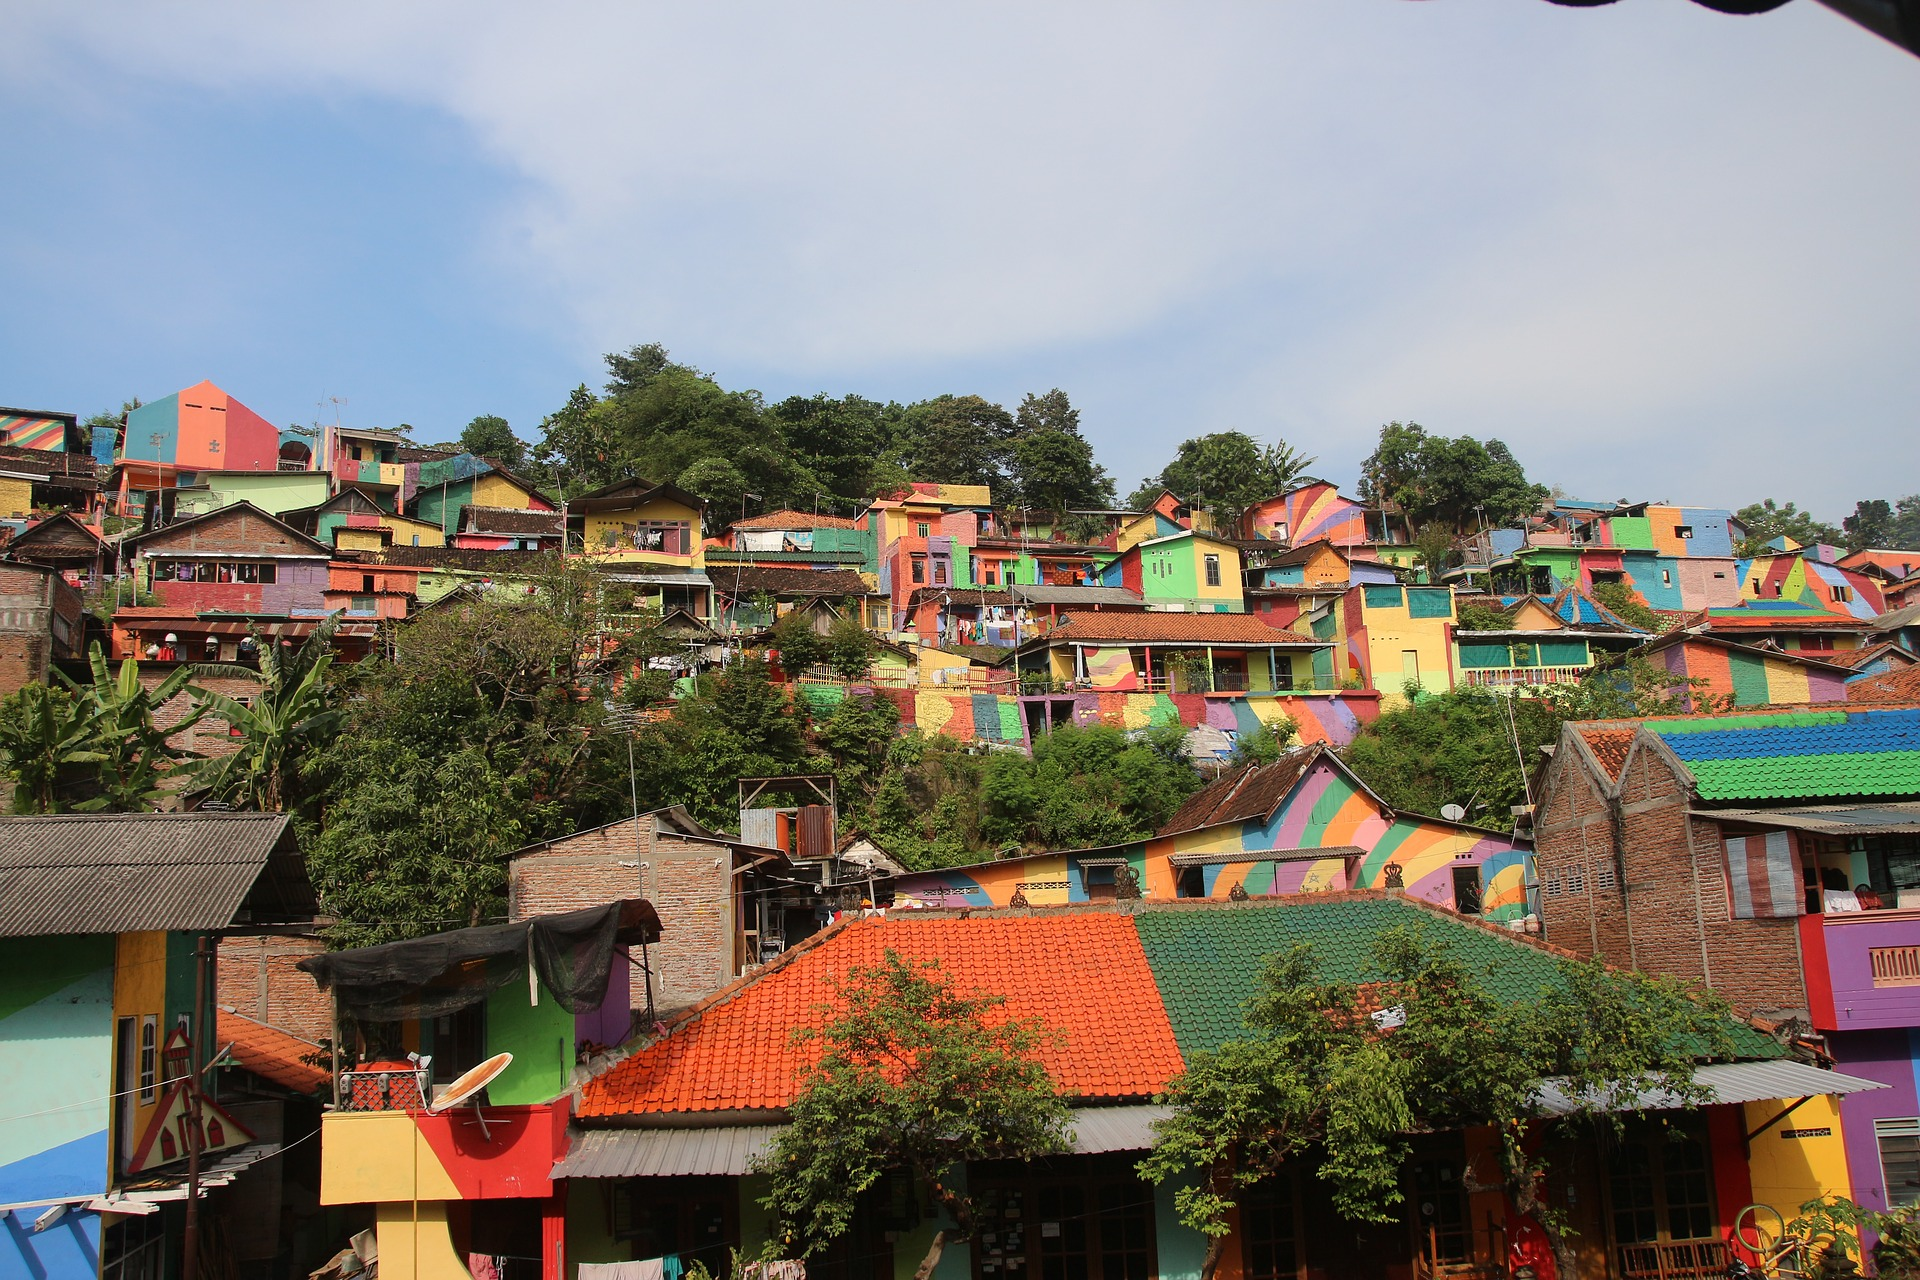 Colorful rainbow painted village